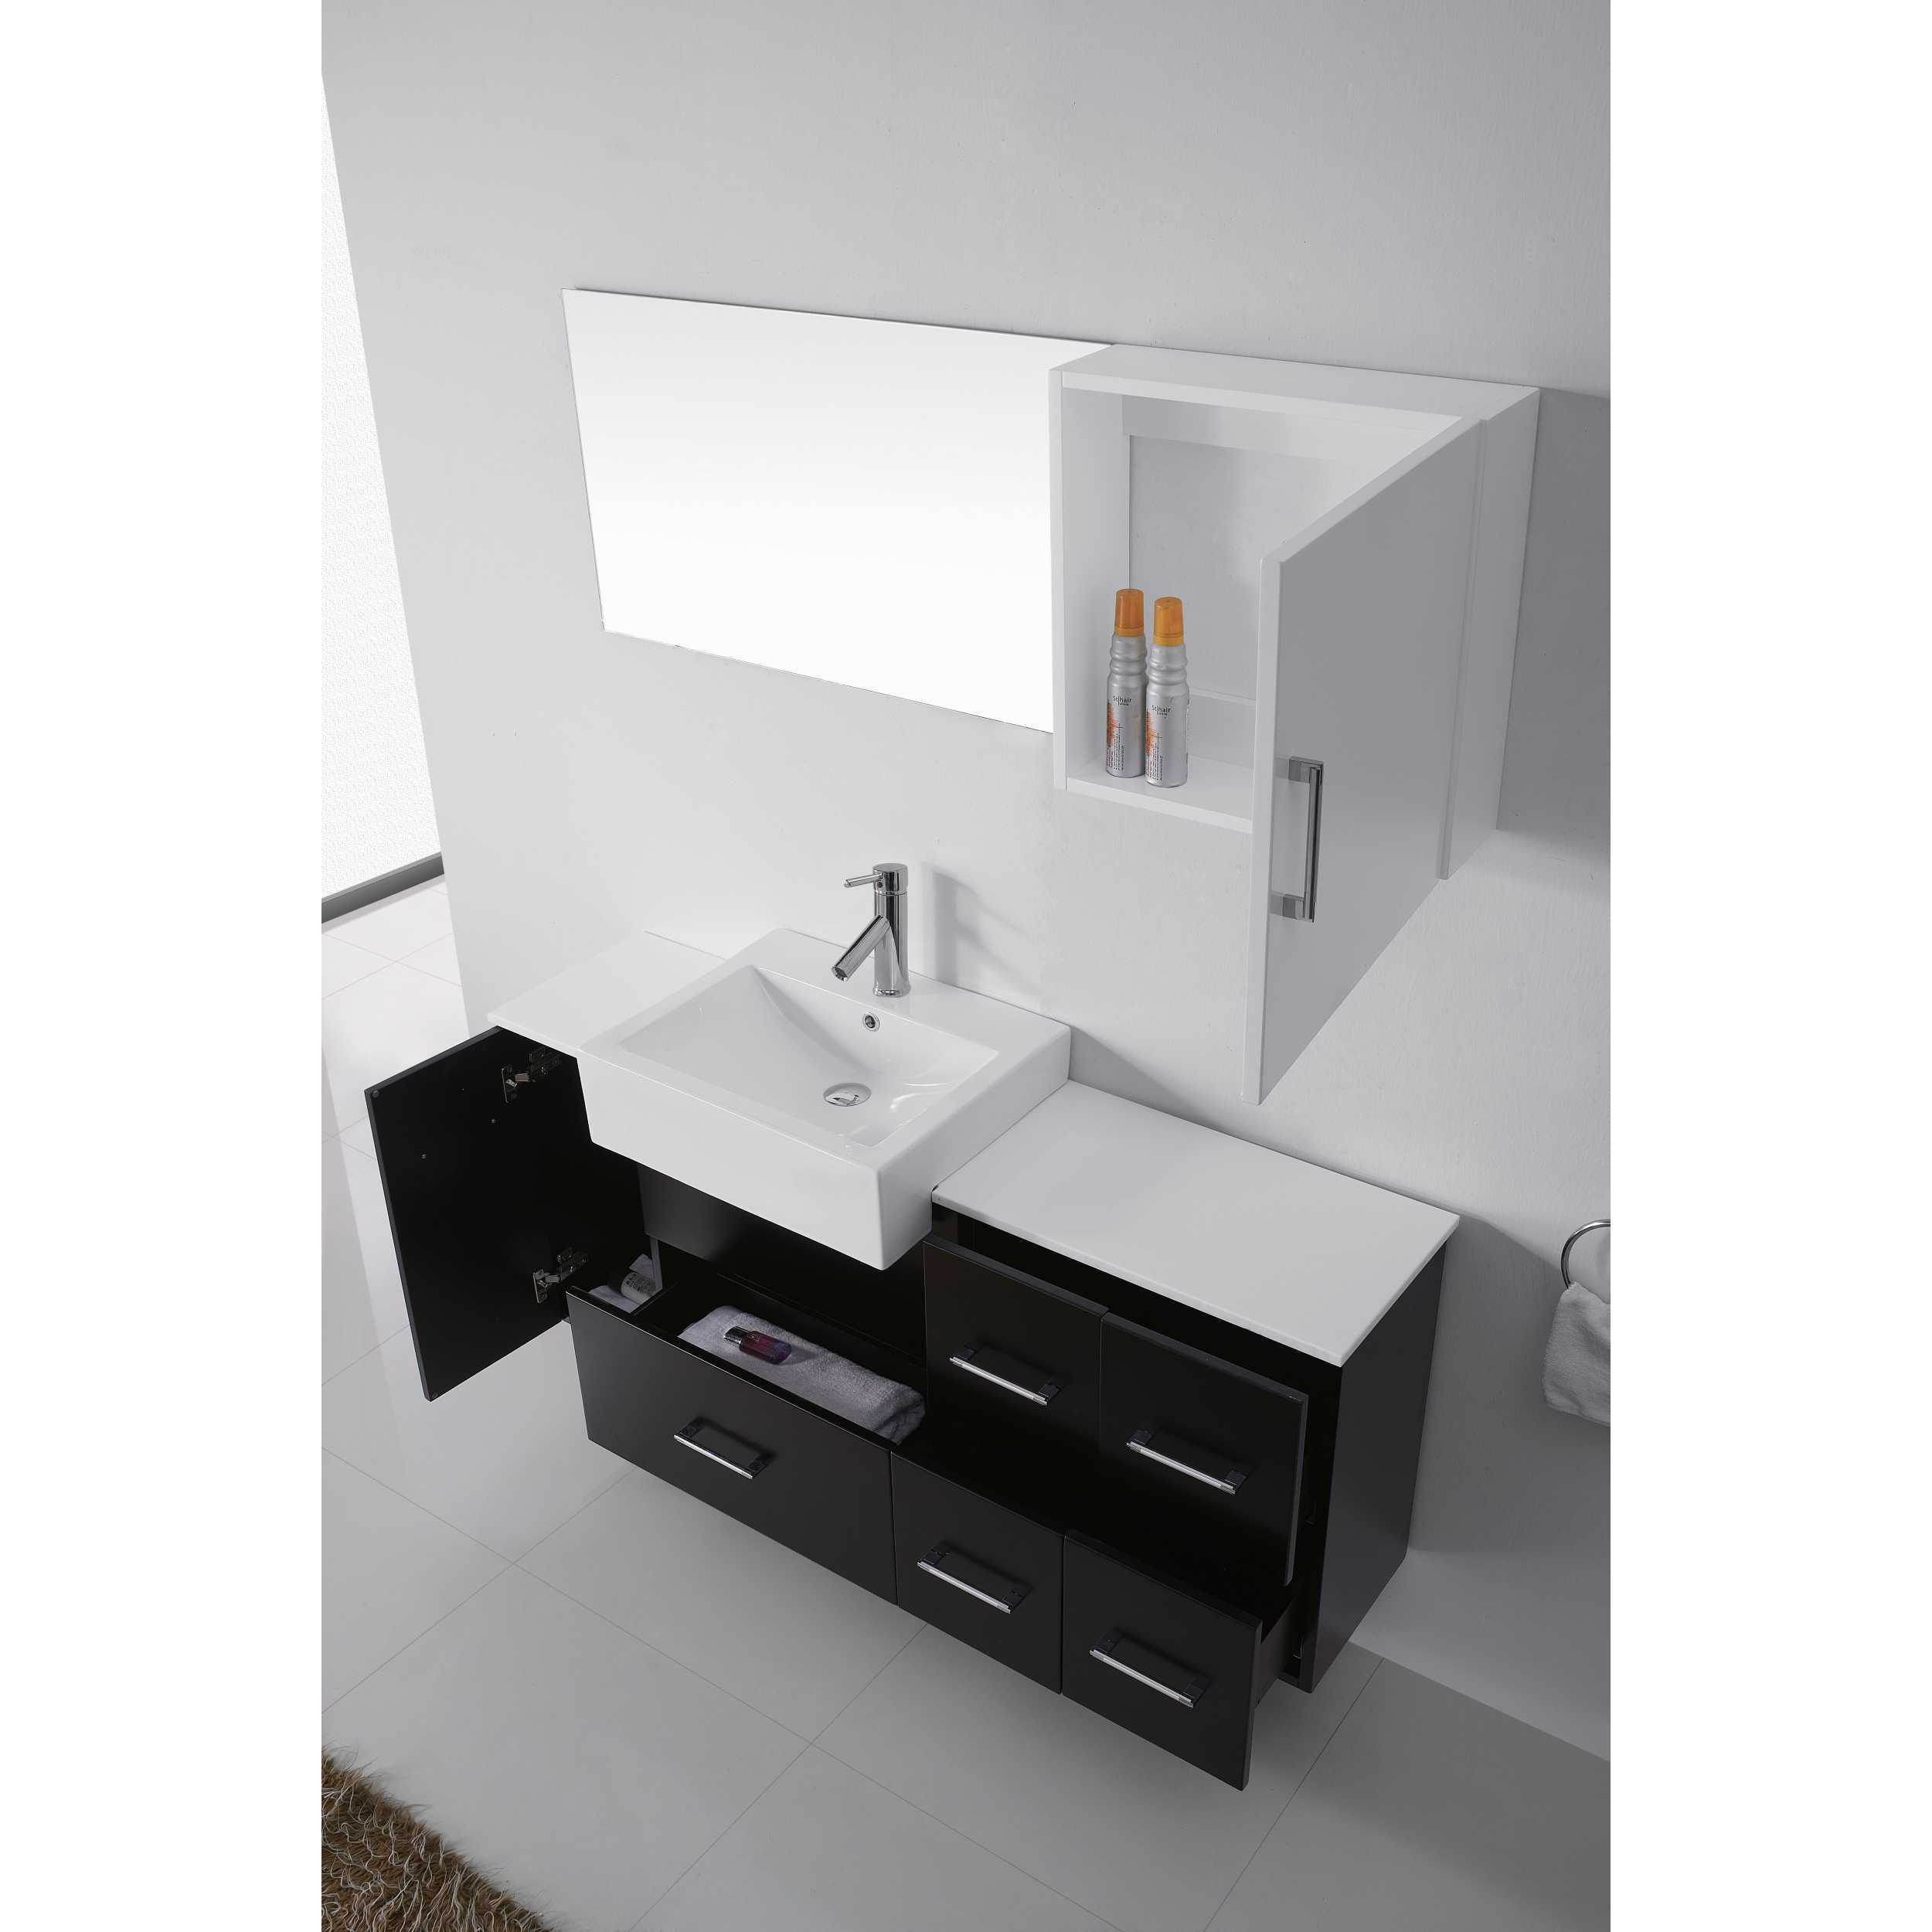 Virtu usa hazel 56 inch single sink bathroom vanity set free - Virtu Hazel 56 Quot Single Bathroom Vanity Set With Black Top And Mirror Virtu Hazel